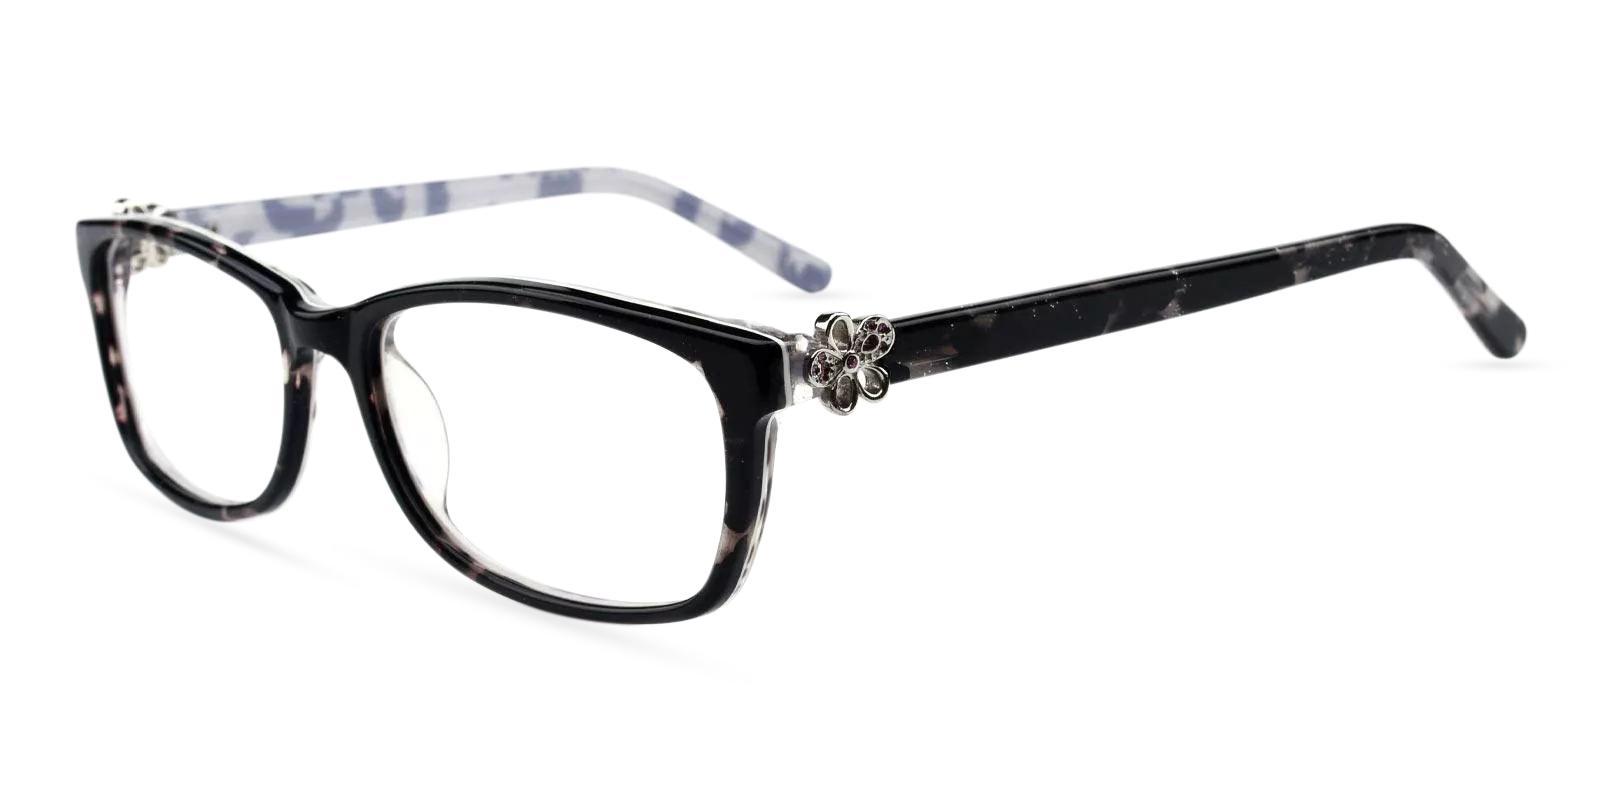 Rosa Black Acetate Eyeglasses , Fashion , UniversalBridgeFit Frames from ABBE Glasses